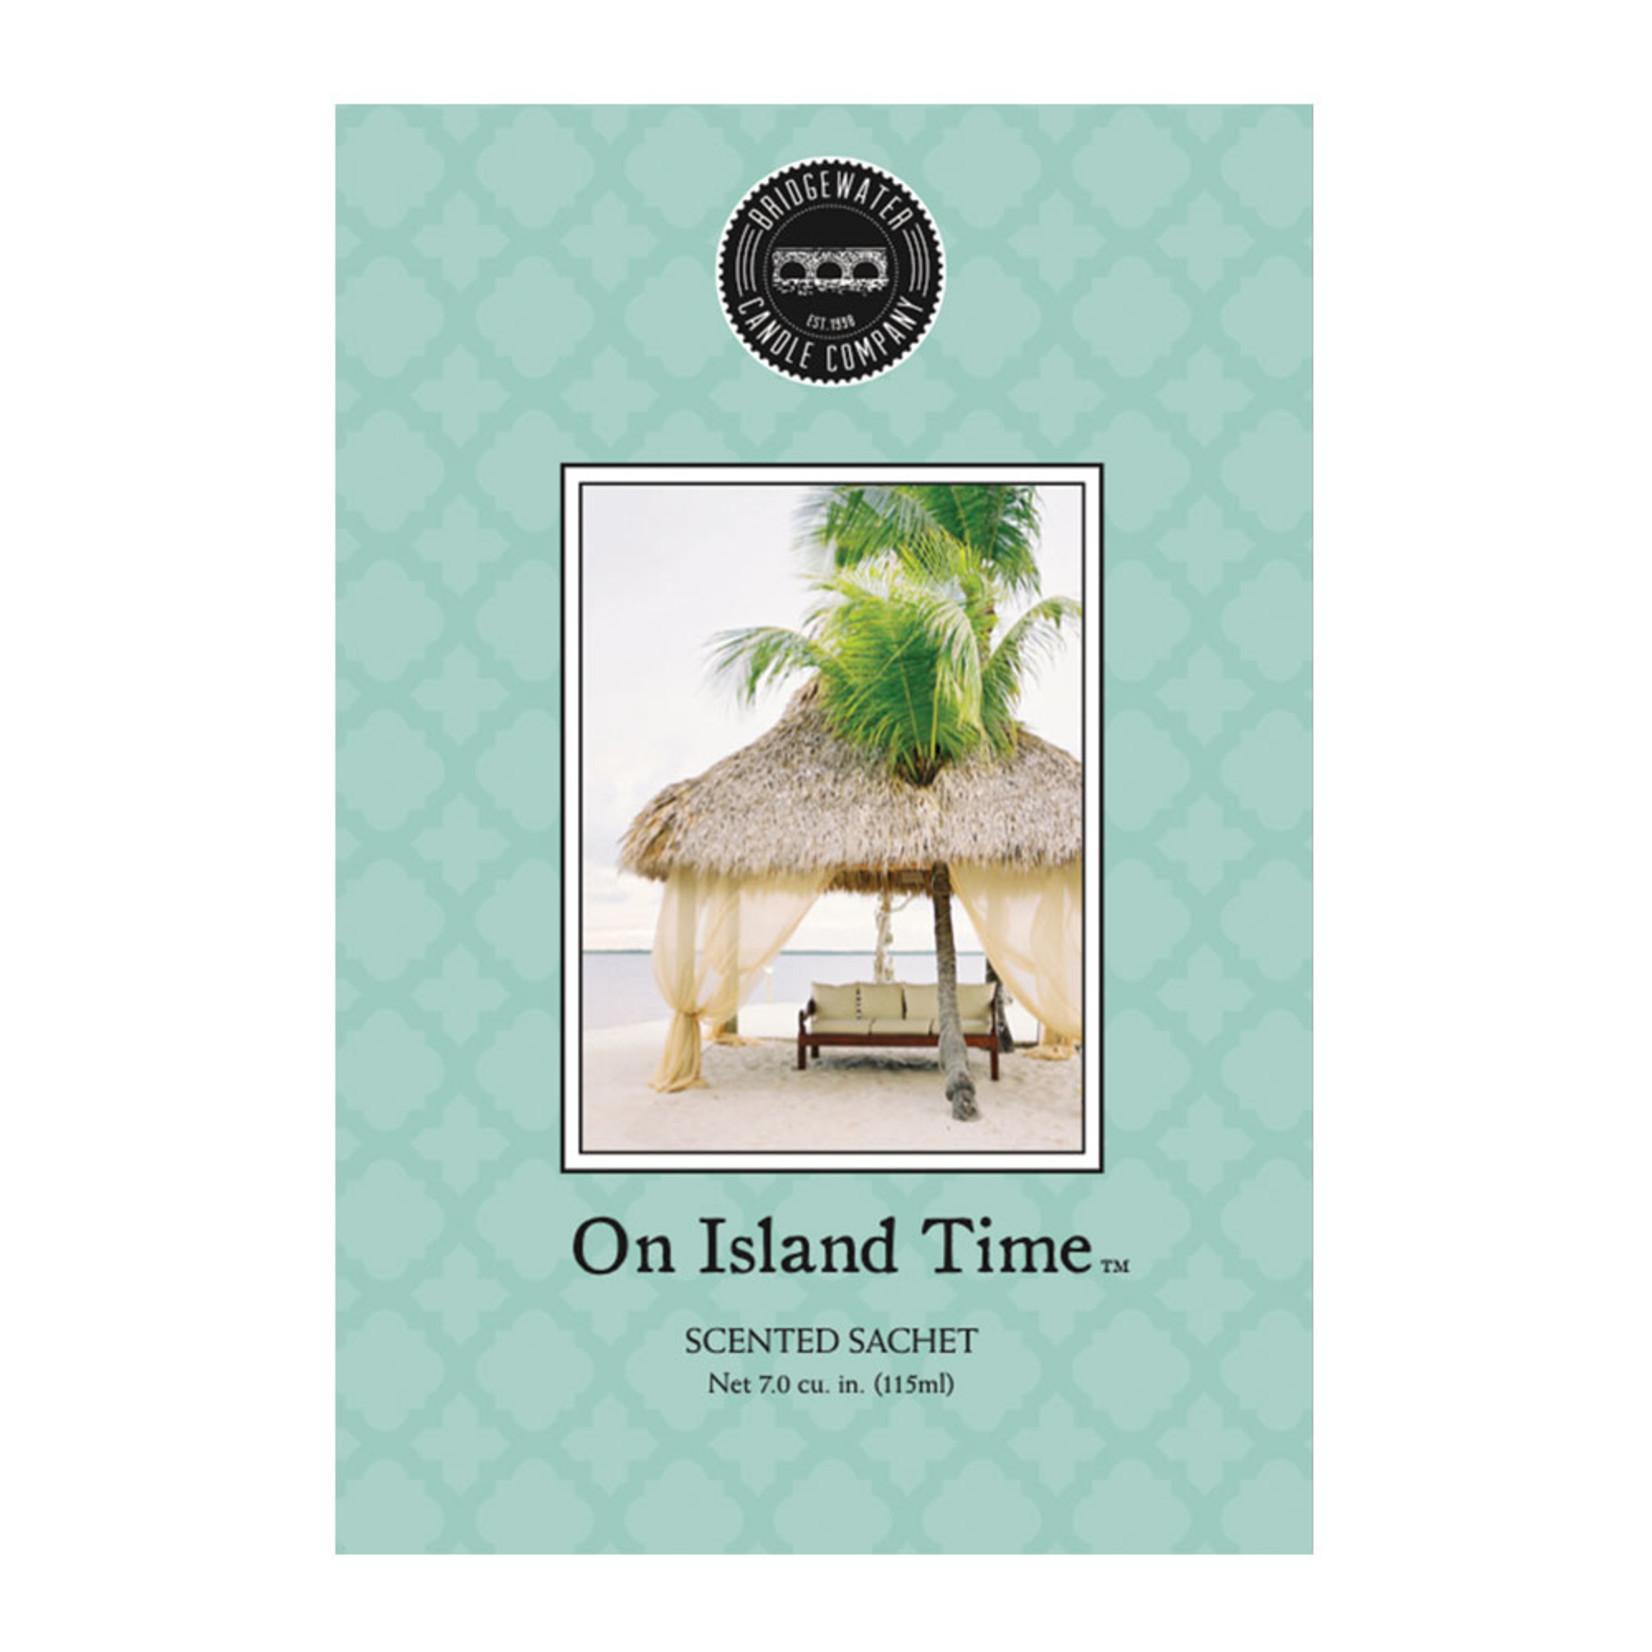 Bridgewater Scented Sachet / Geurzakje On Island Time